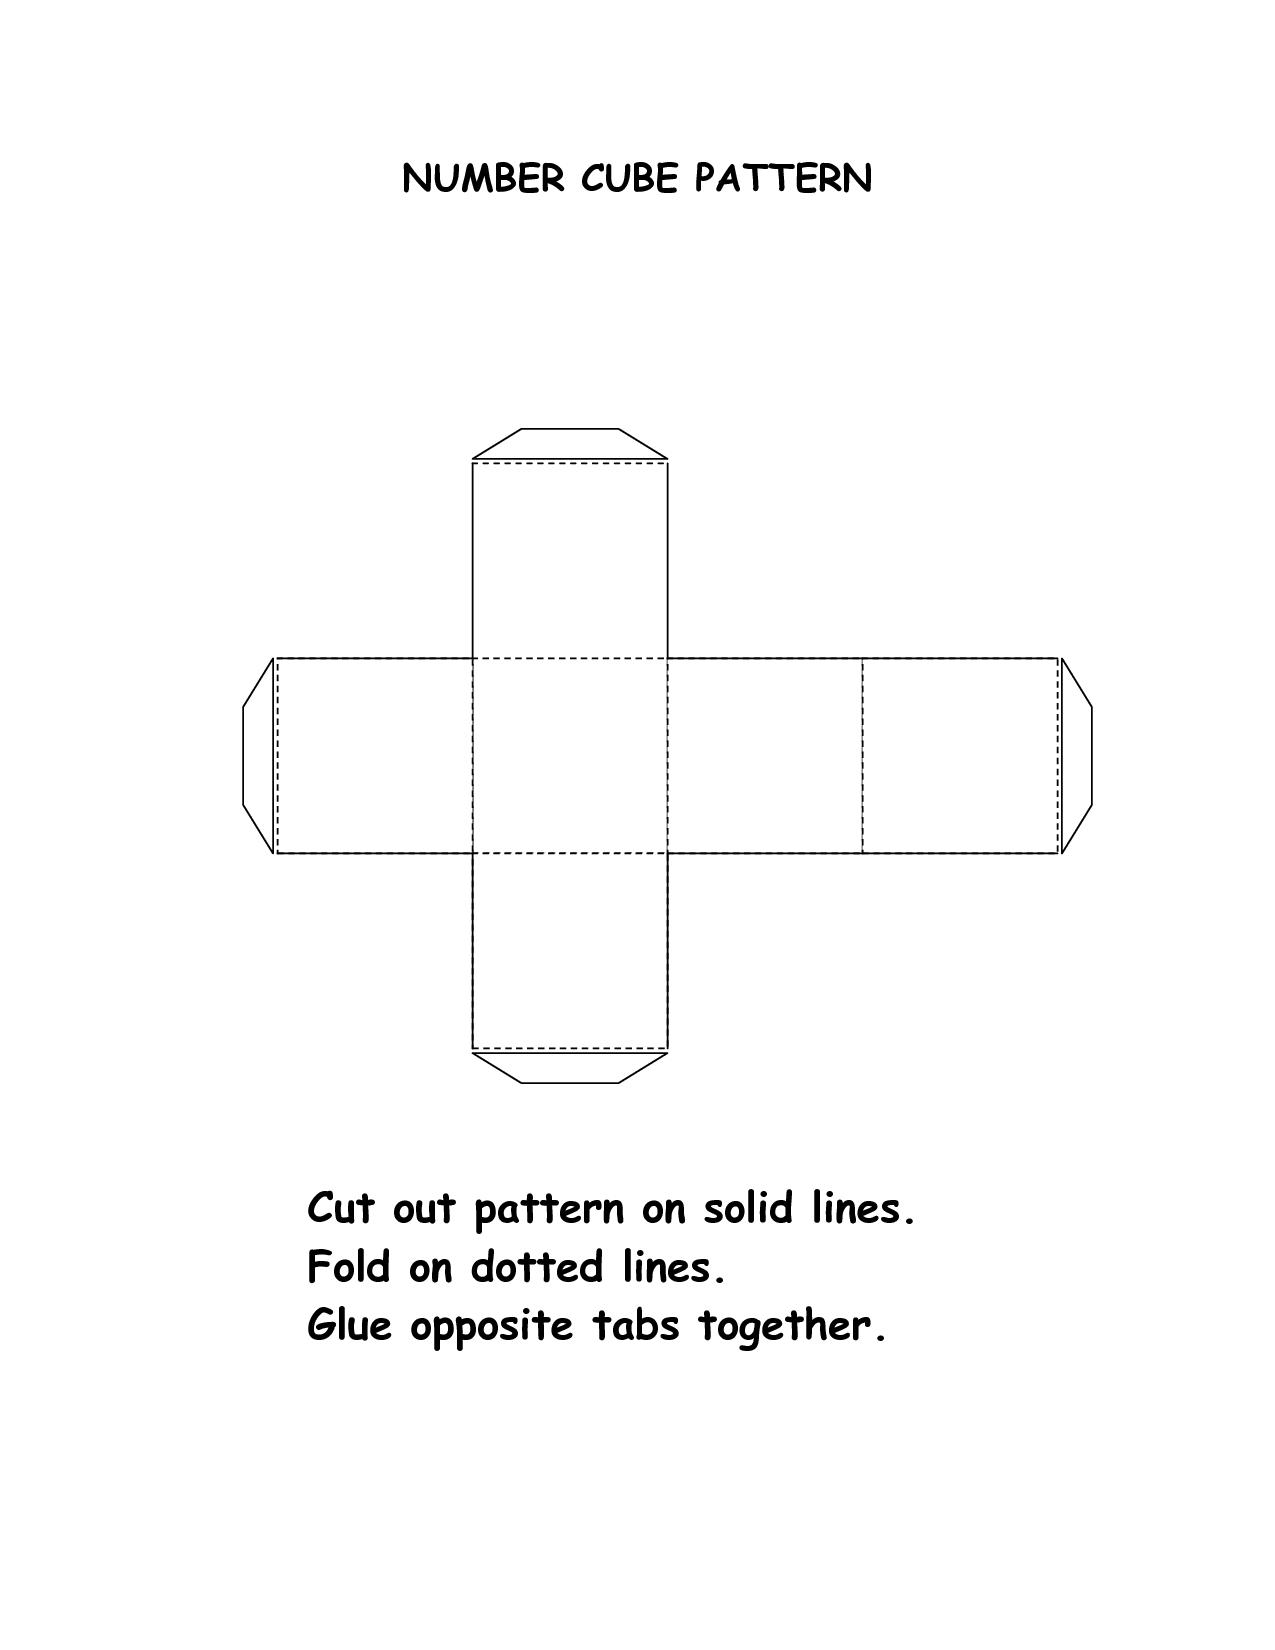 Rectangular Prism Cut Out Shape